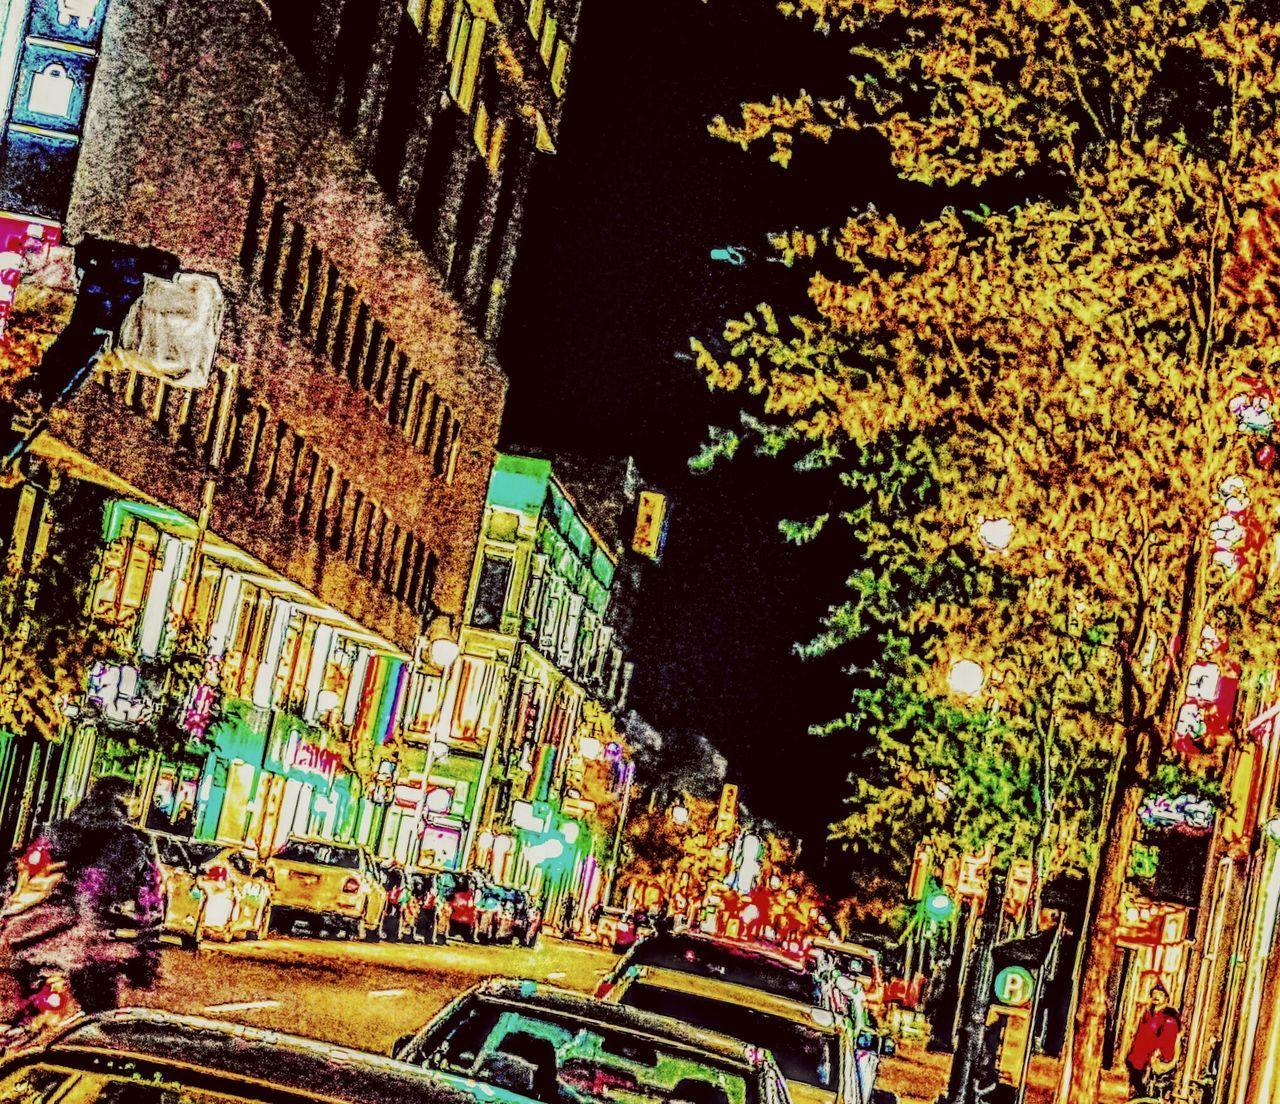 Montréal Centre-Ville Automne Automne2016 Ville City Life Autumn2016 Multi Colored City Architecture Outdoors Nuits Ciudad Centro Motion Night Lights Street Photography Streetphotography Street Photo Walkway Walking Cityscape